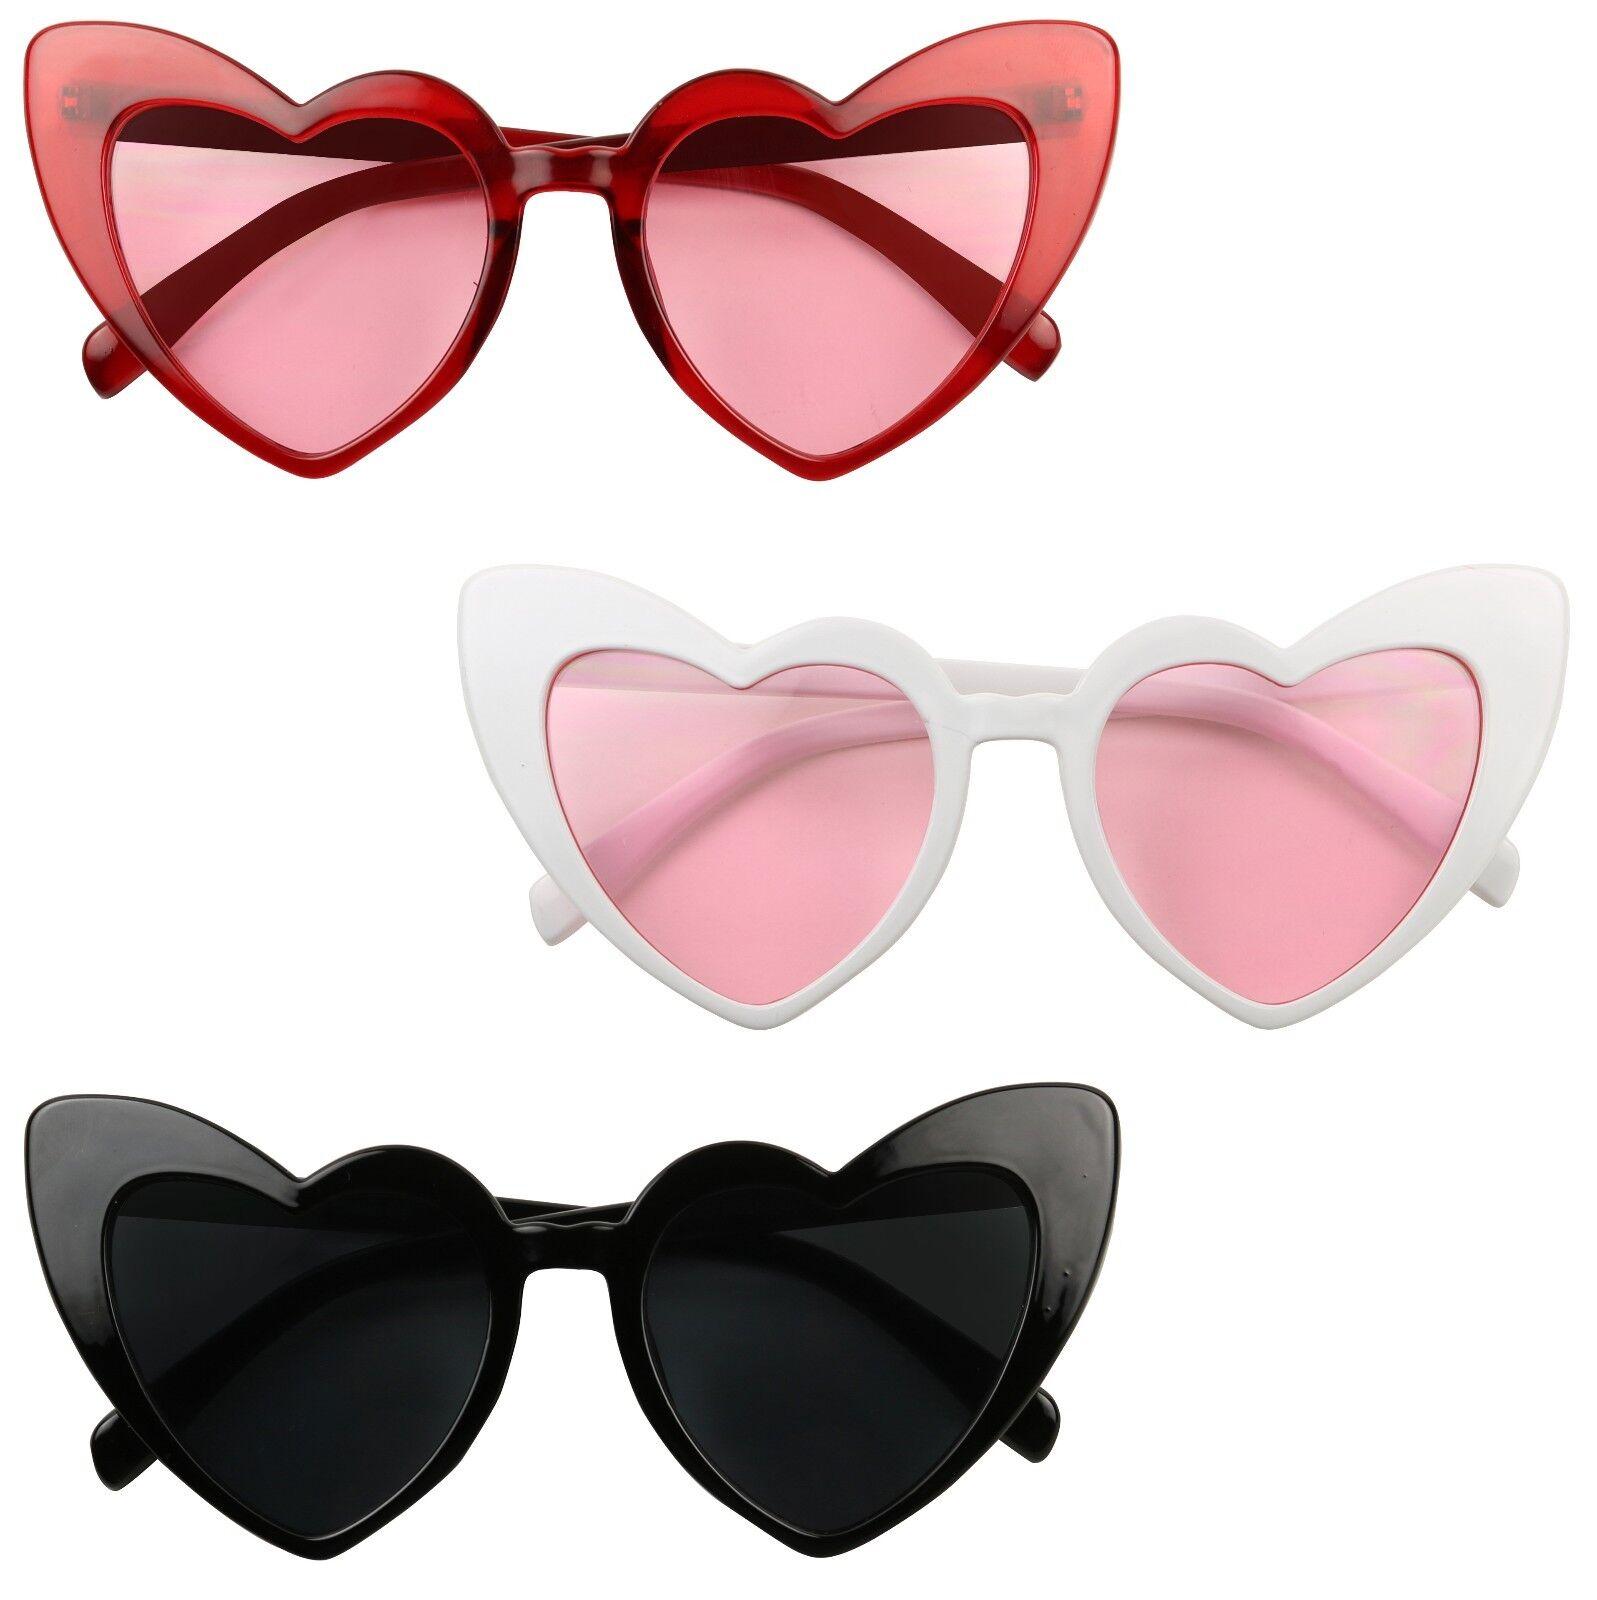 ShadyVEU Love Heart Shaped Chunky Bold Oversized Tinted Color Sunglasses